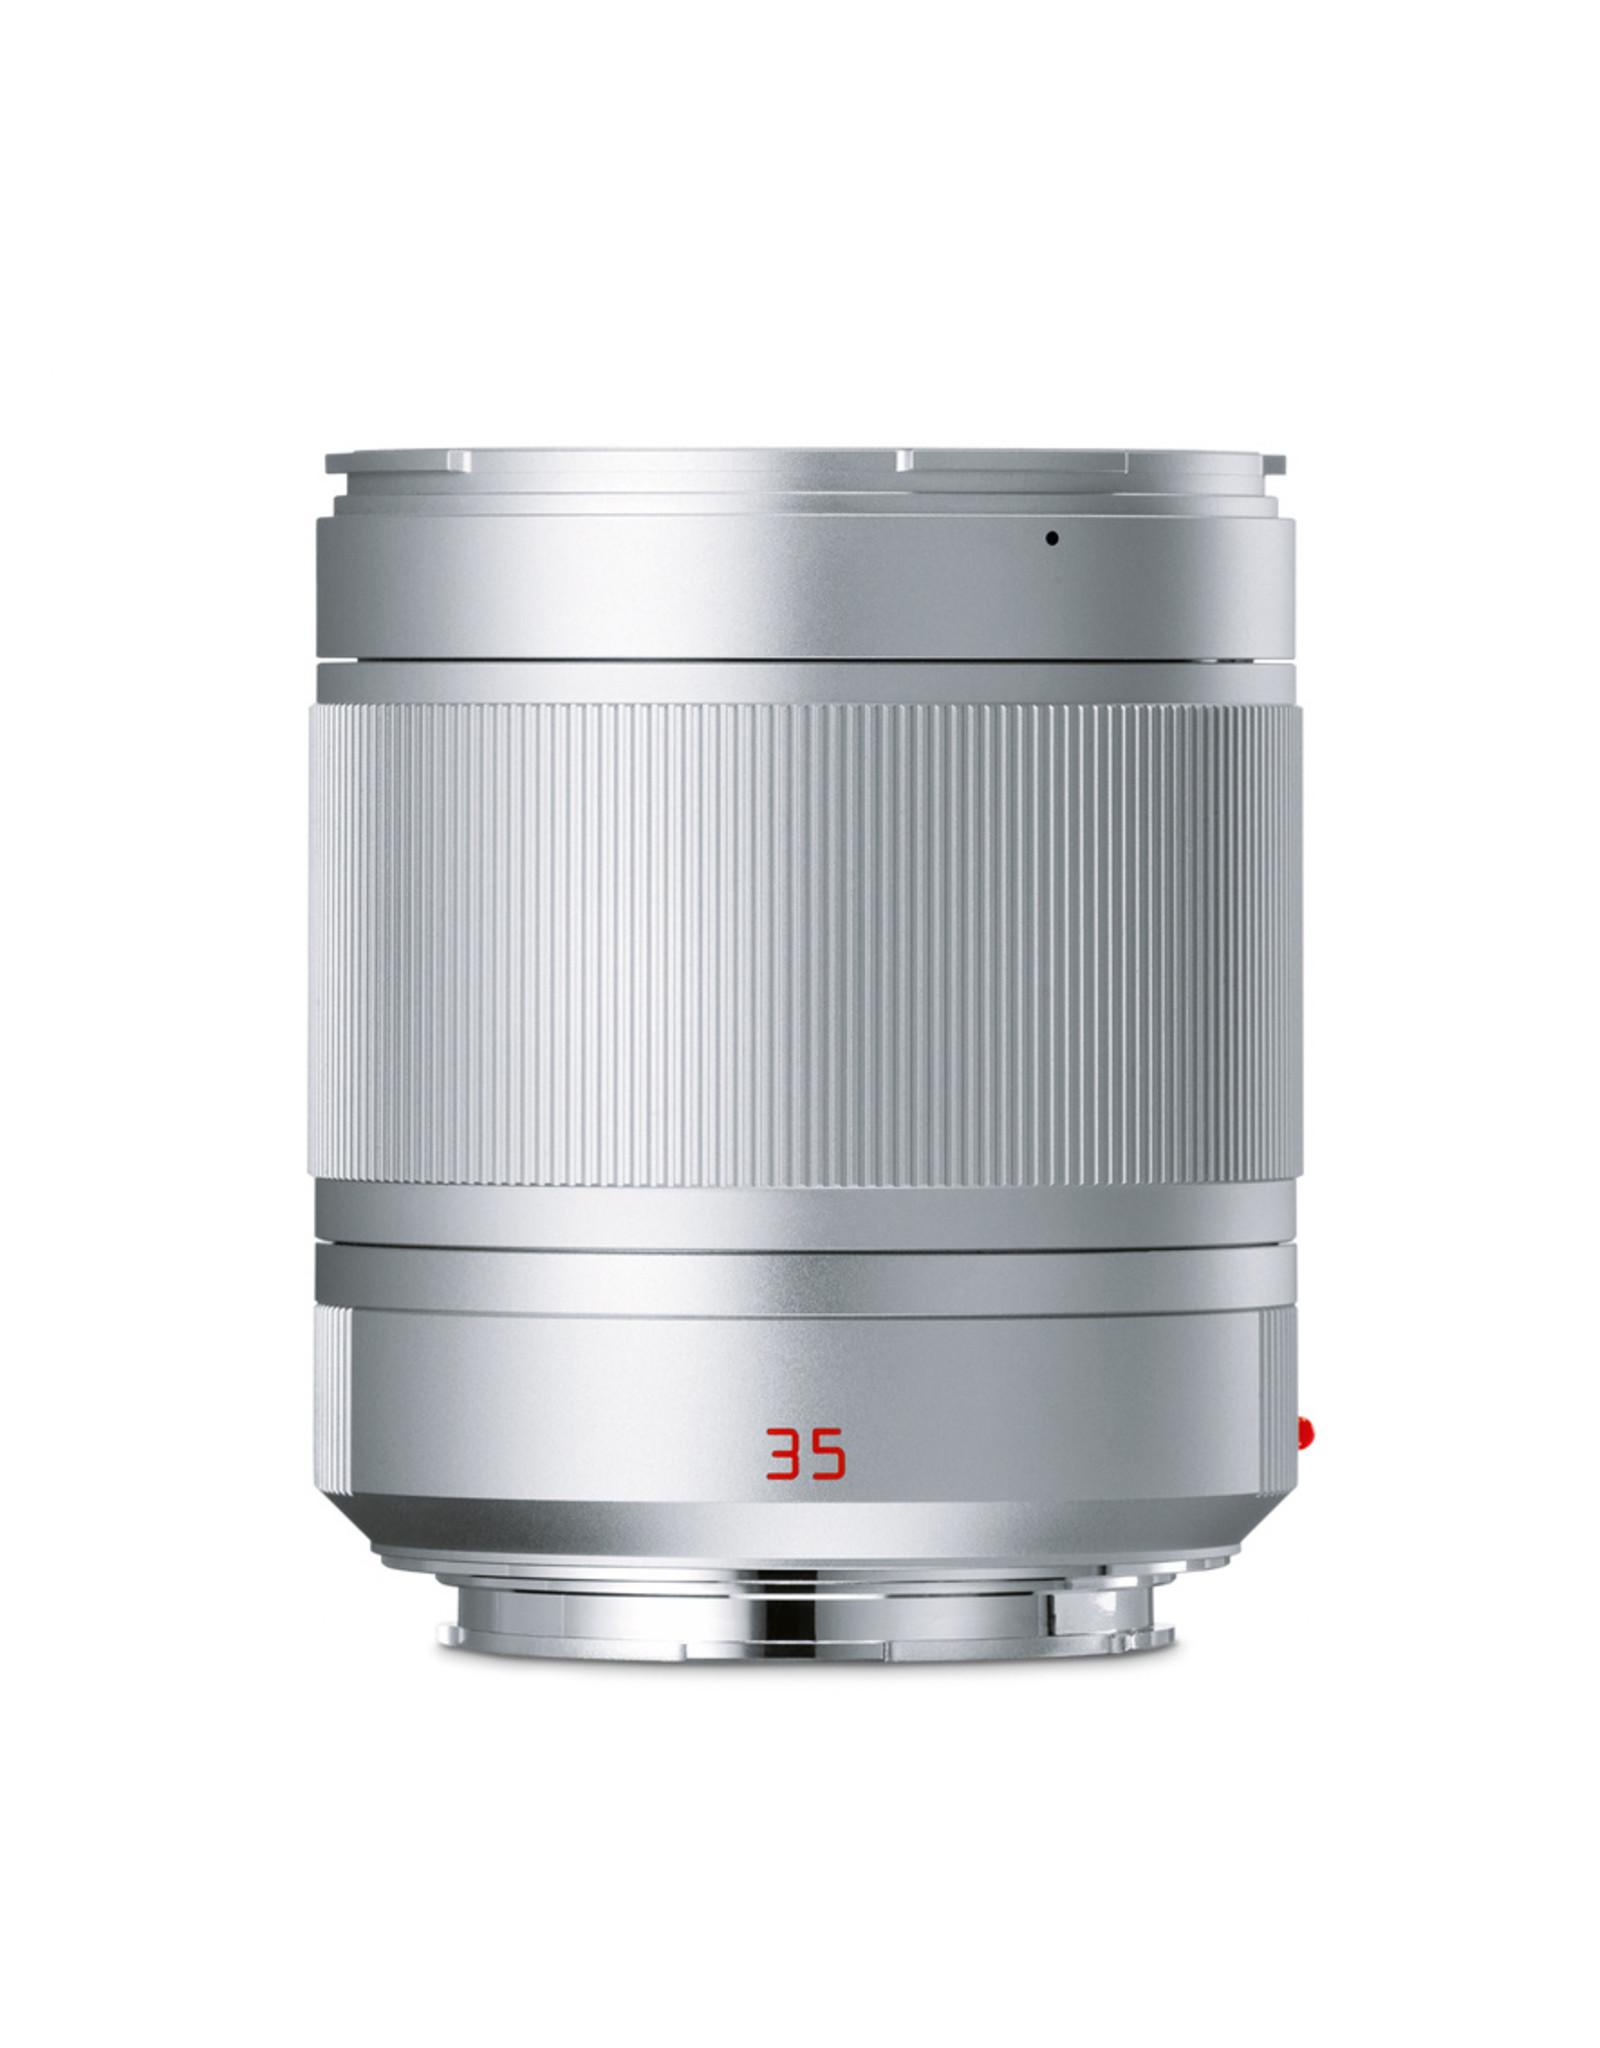 Leica Leica 35mm f1.4 Summilux-TL Silver Anodized  110-85